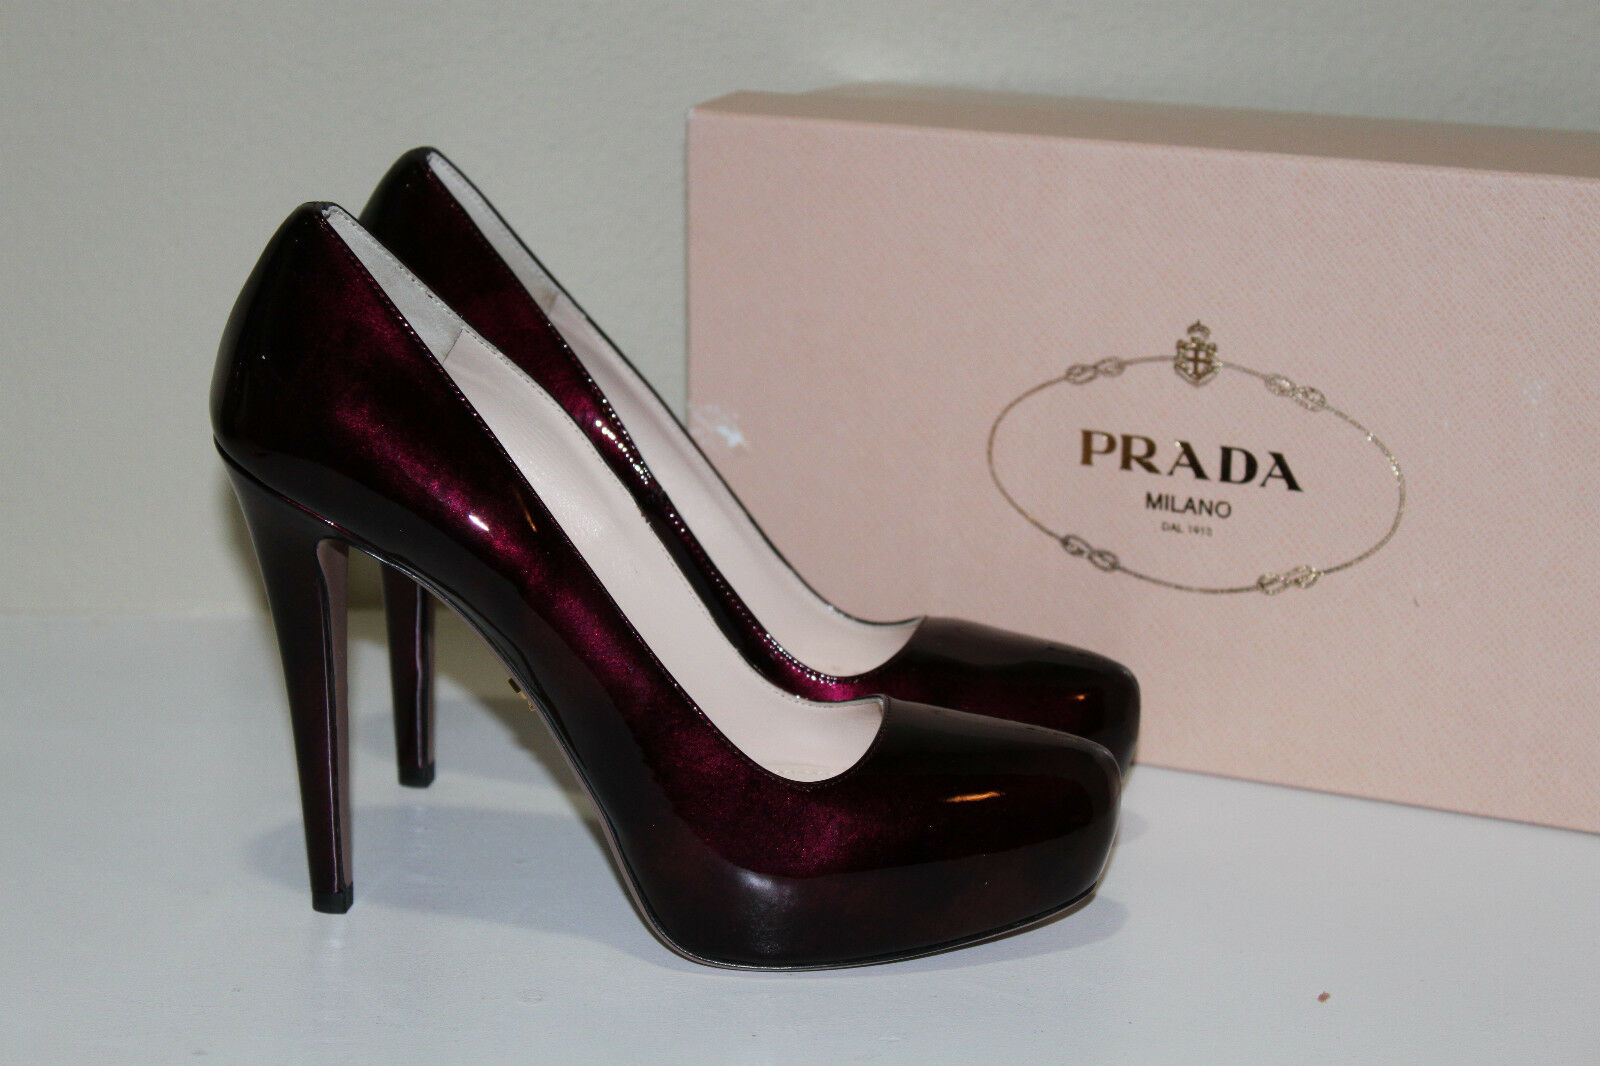 Prada 9.5 / 39.5 Light Burgundy Patent Leather Platform Classic Pump Heel Shoes